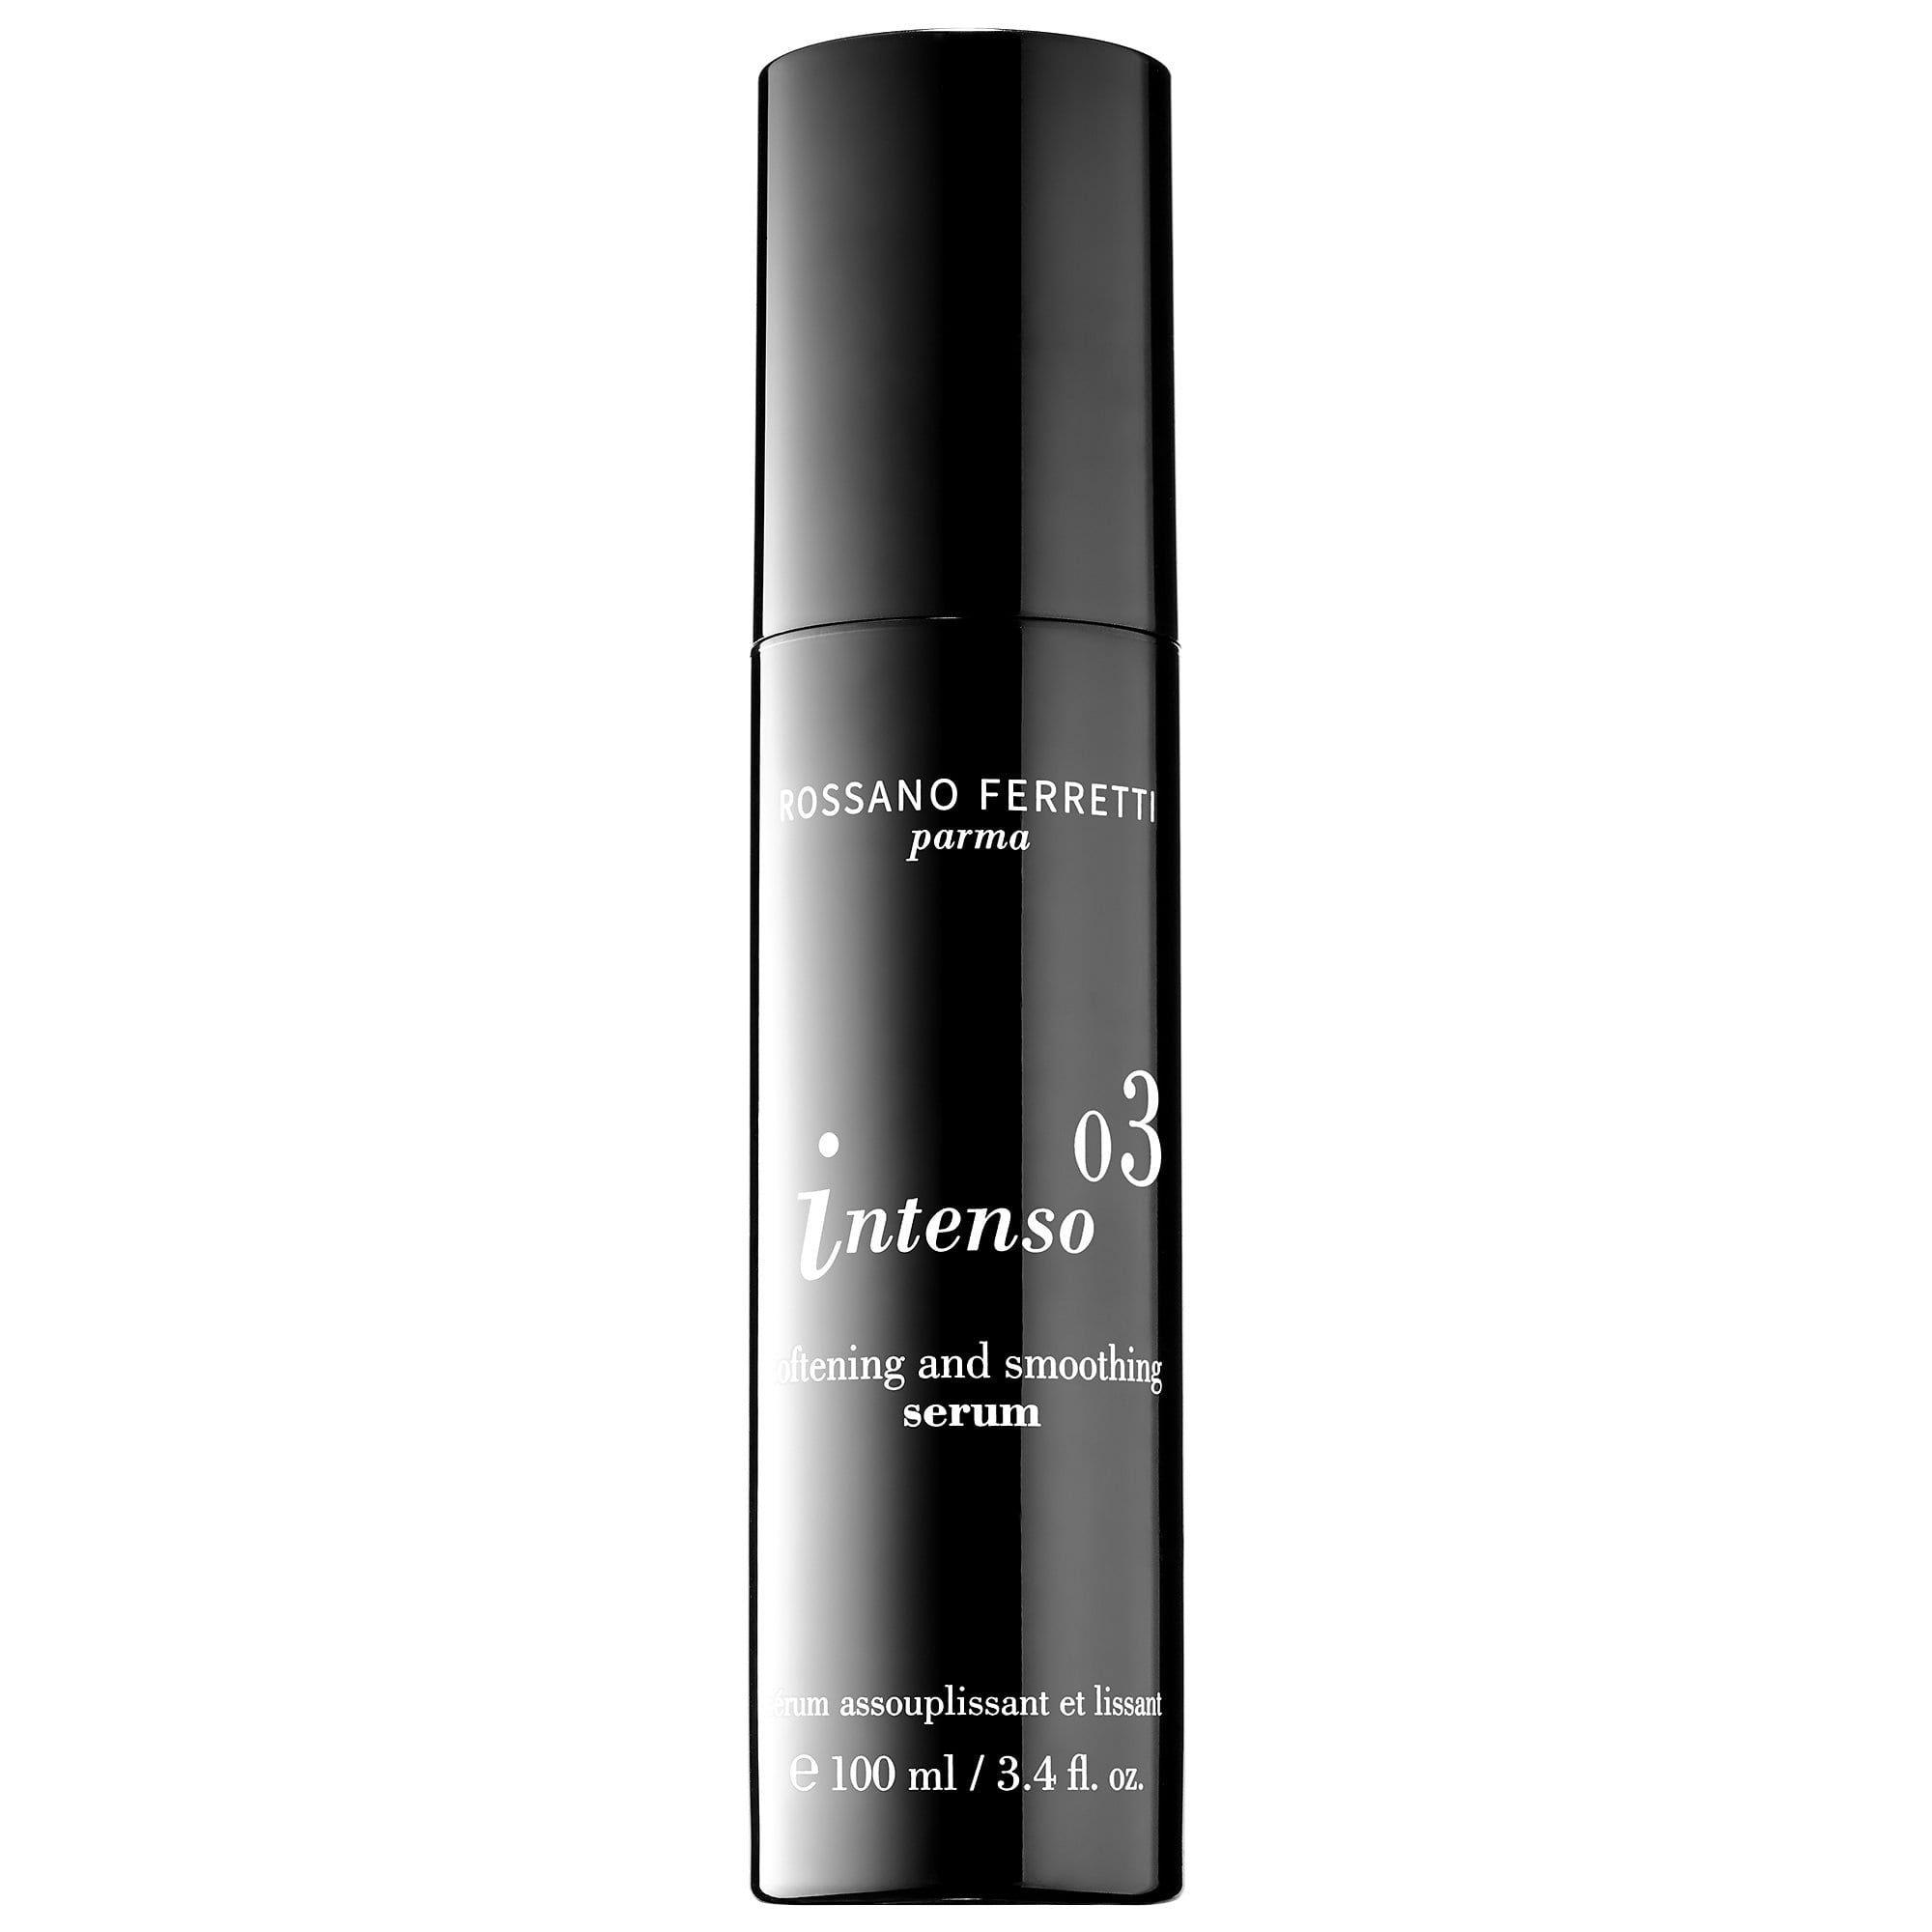 Intenso 03 Softening and Smoothing Serum Detangler spray